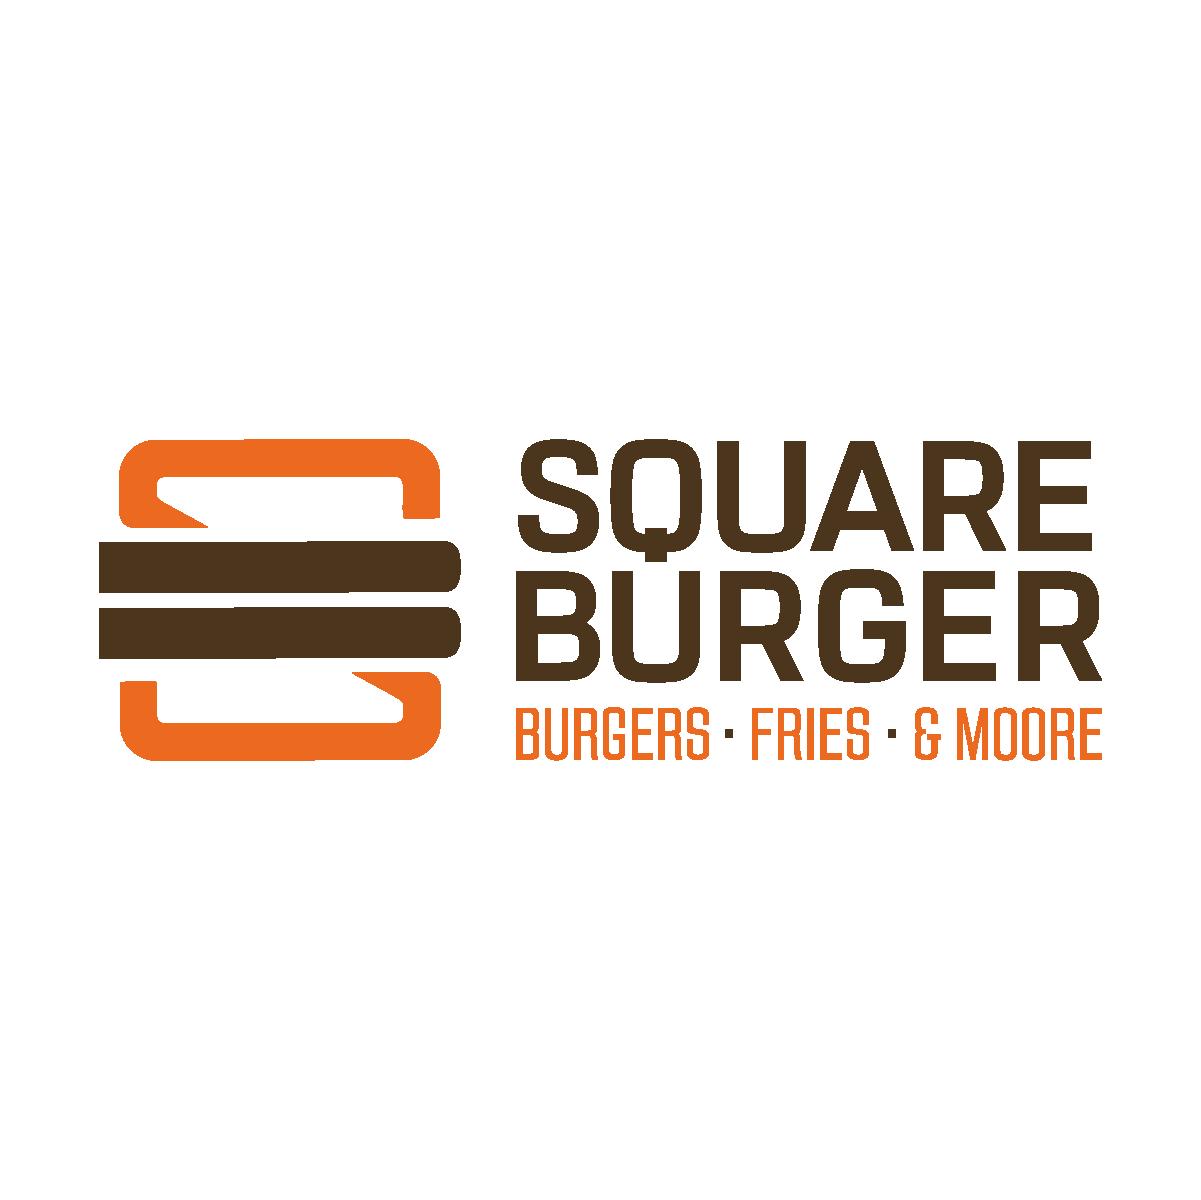 Square Burger horizontal lockup